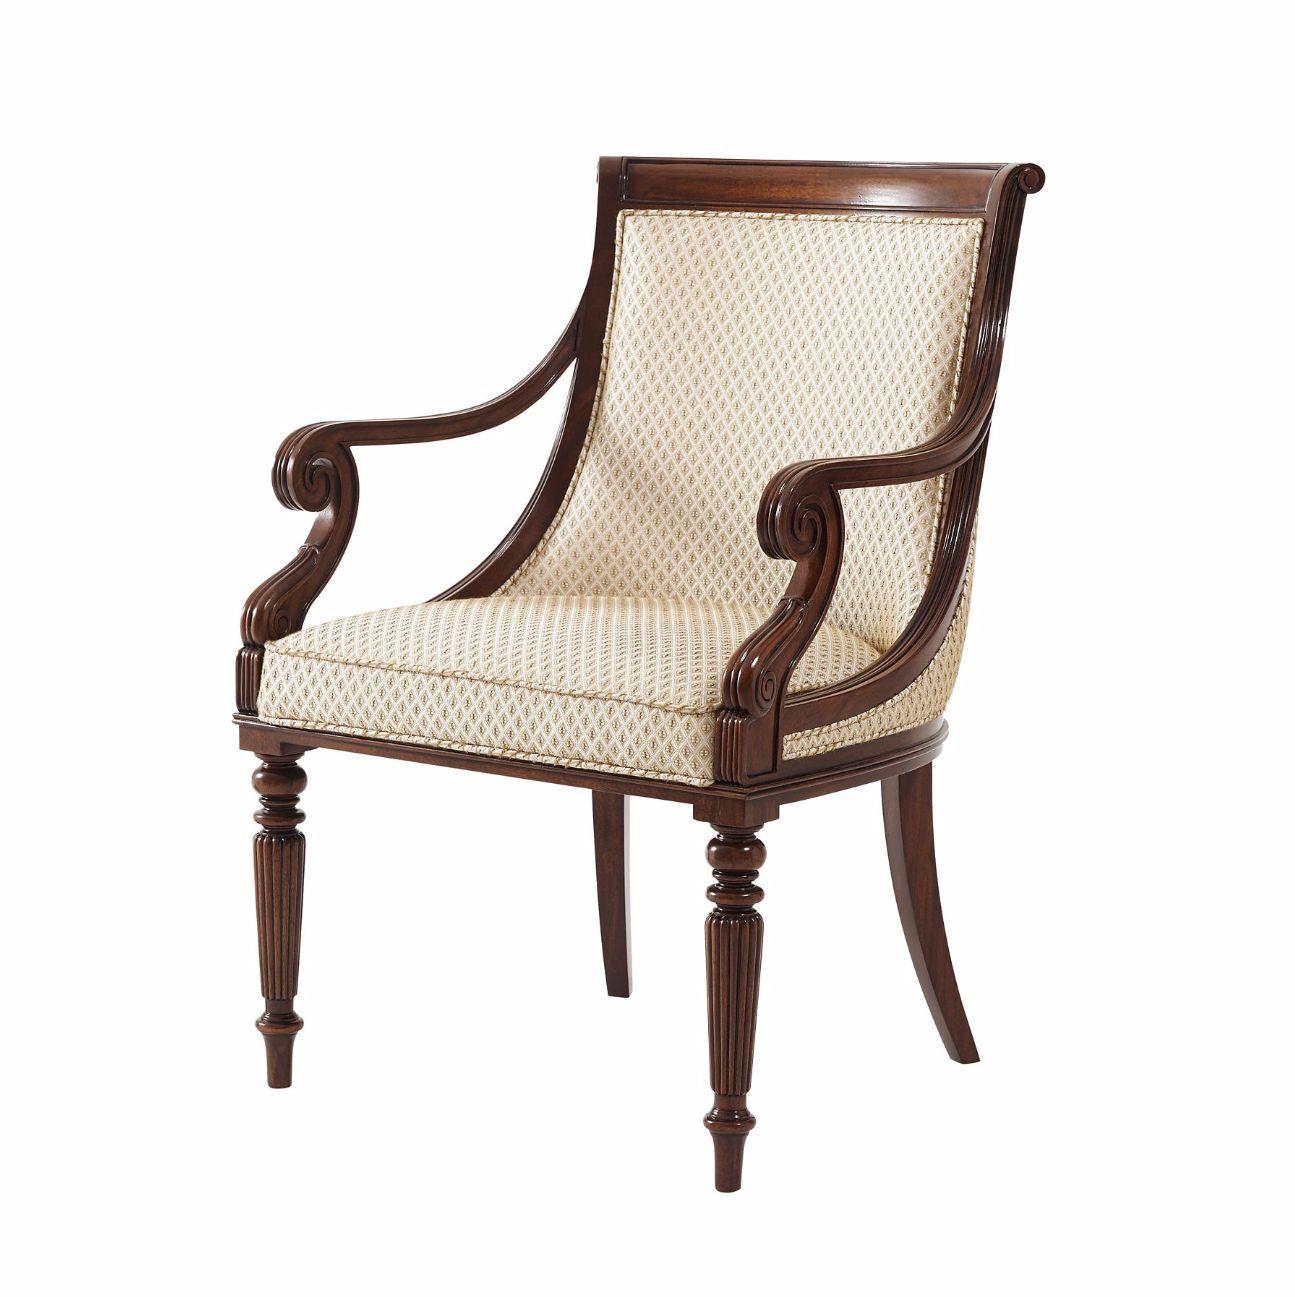 Regency Mahogany Dining Armchair Dining Chairs Dining Furniture Makeover Rustic Dining Furniture